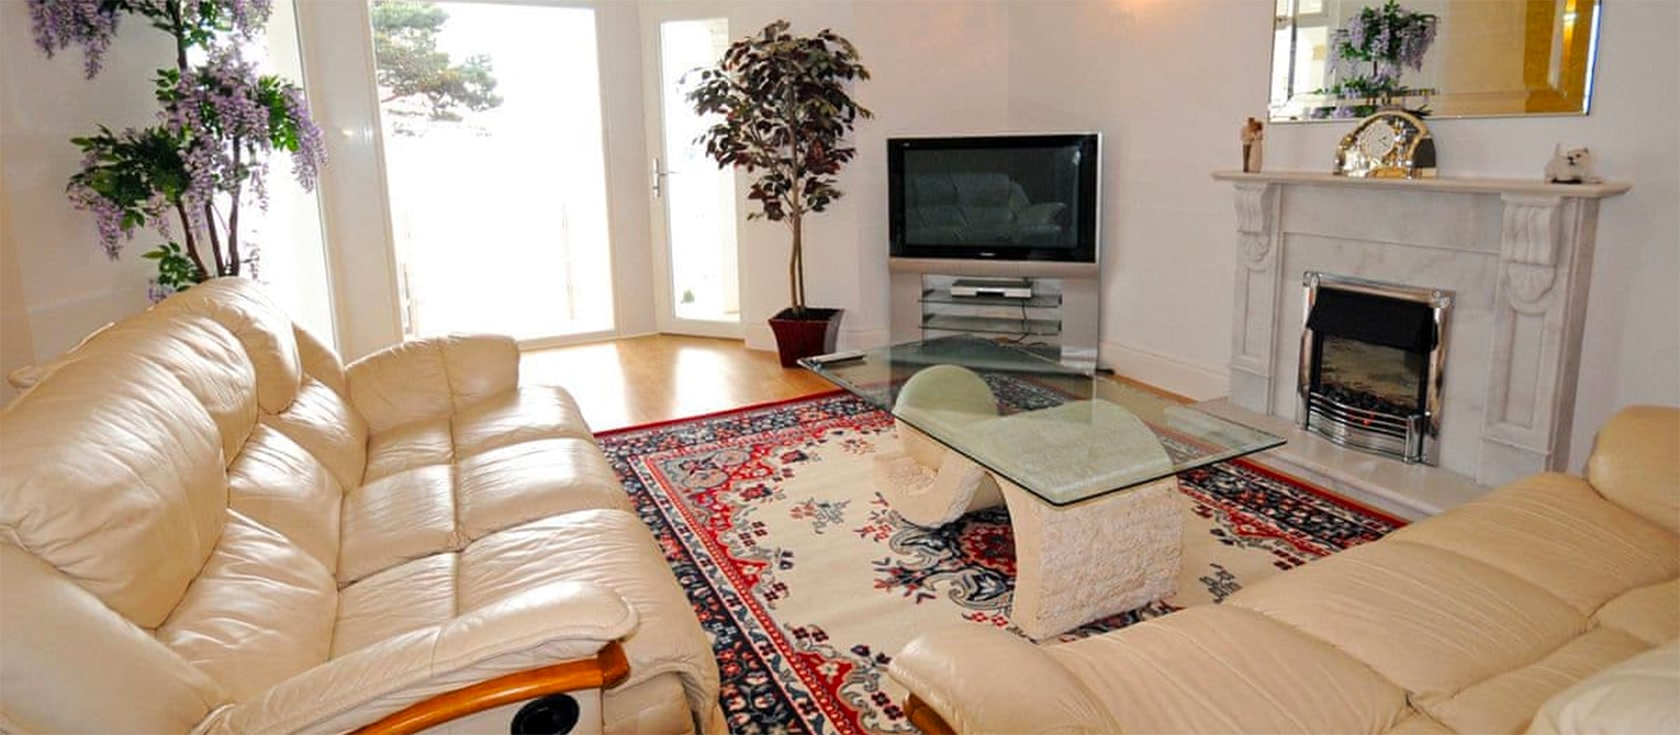 Riviera Apartment, Torquay